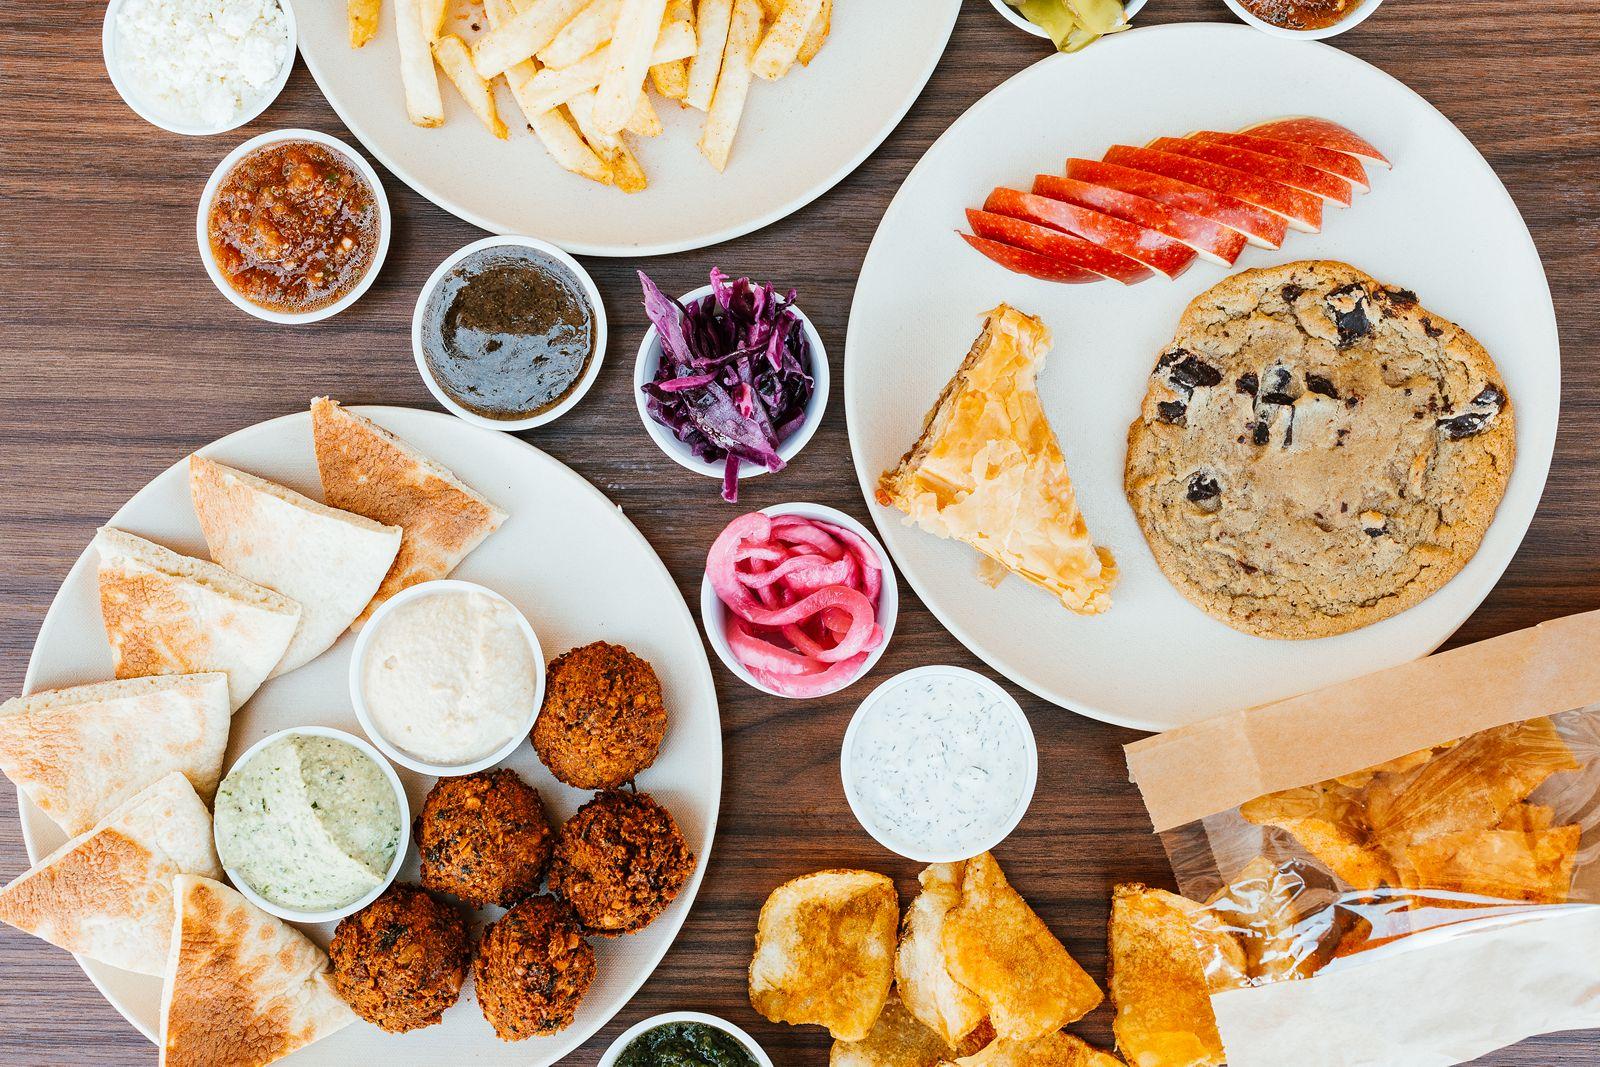 Garbanzo Mediterranean Fresh is Now Serving Love In Every Pita at Saint Louis University